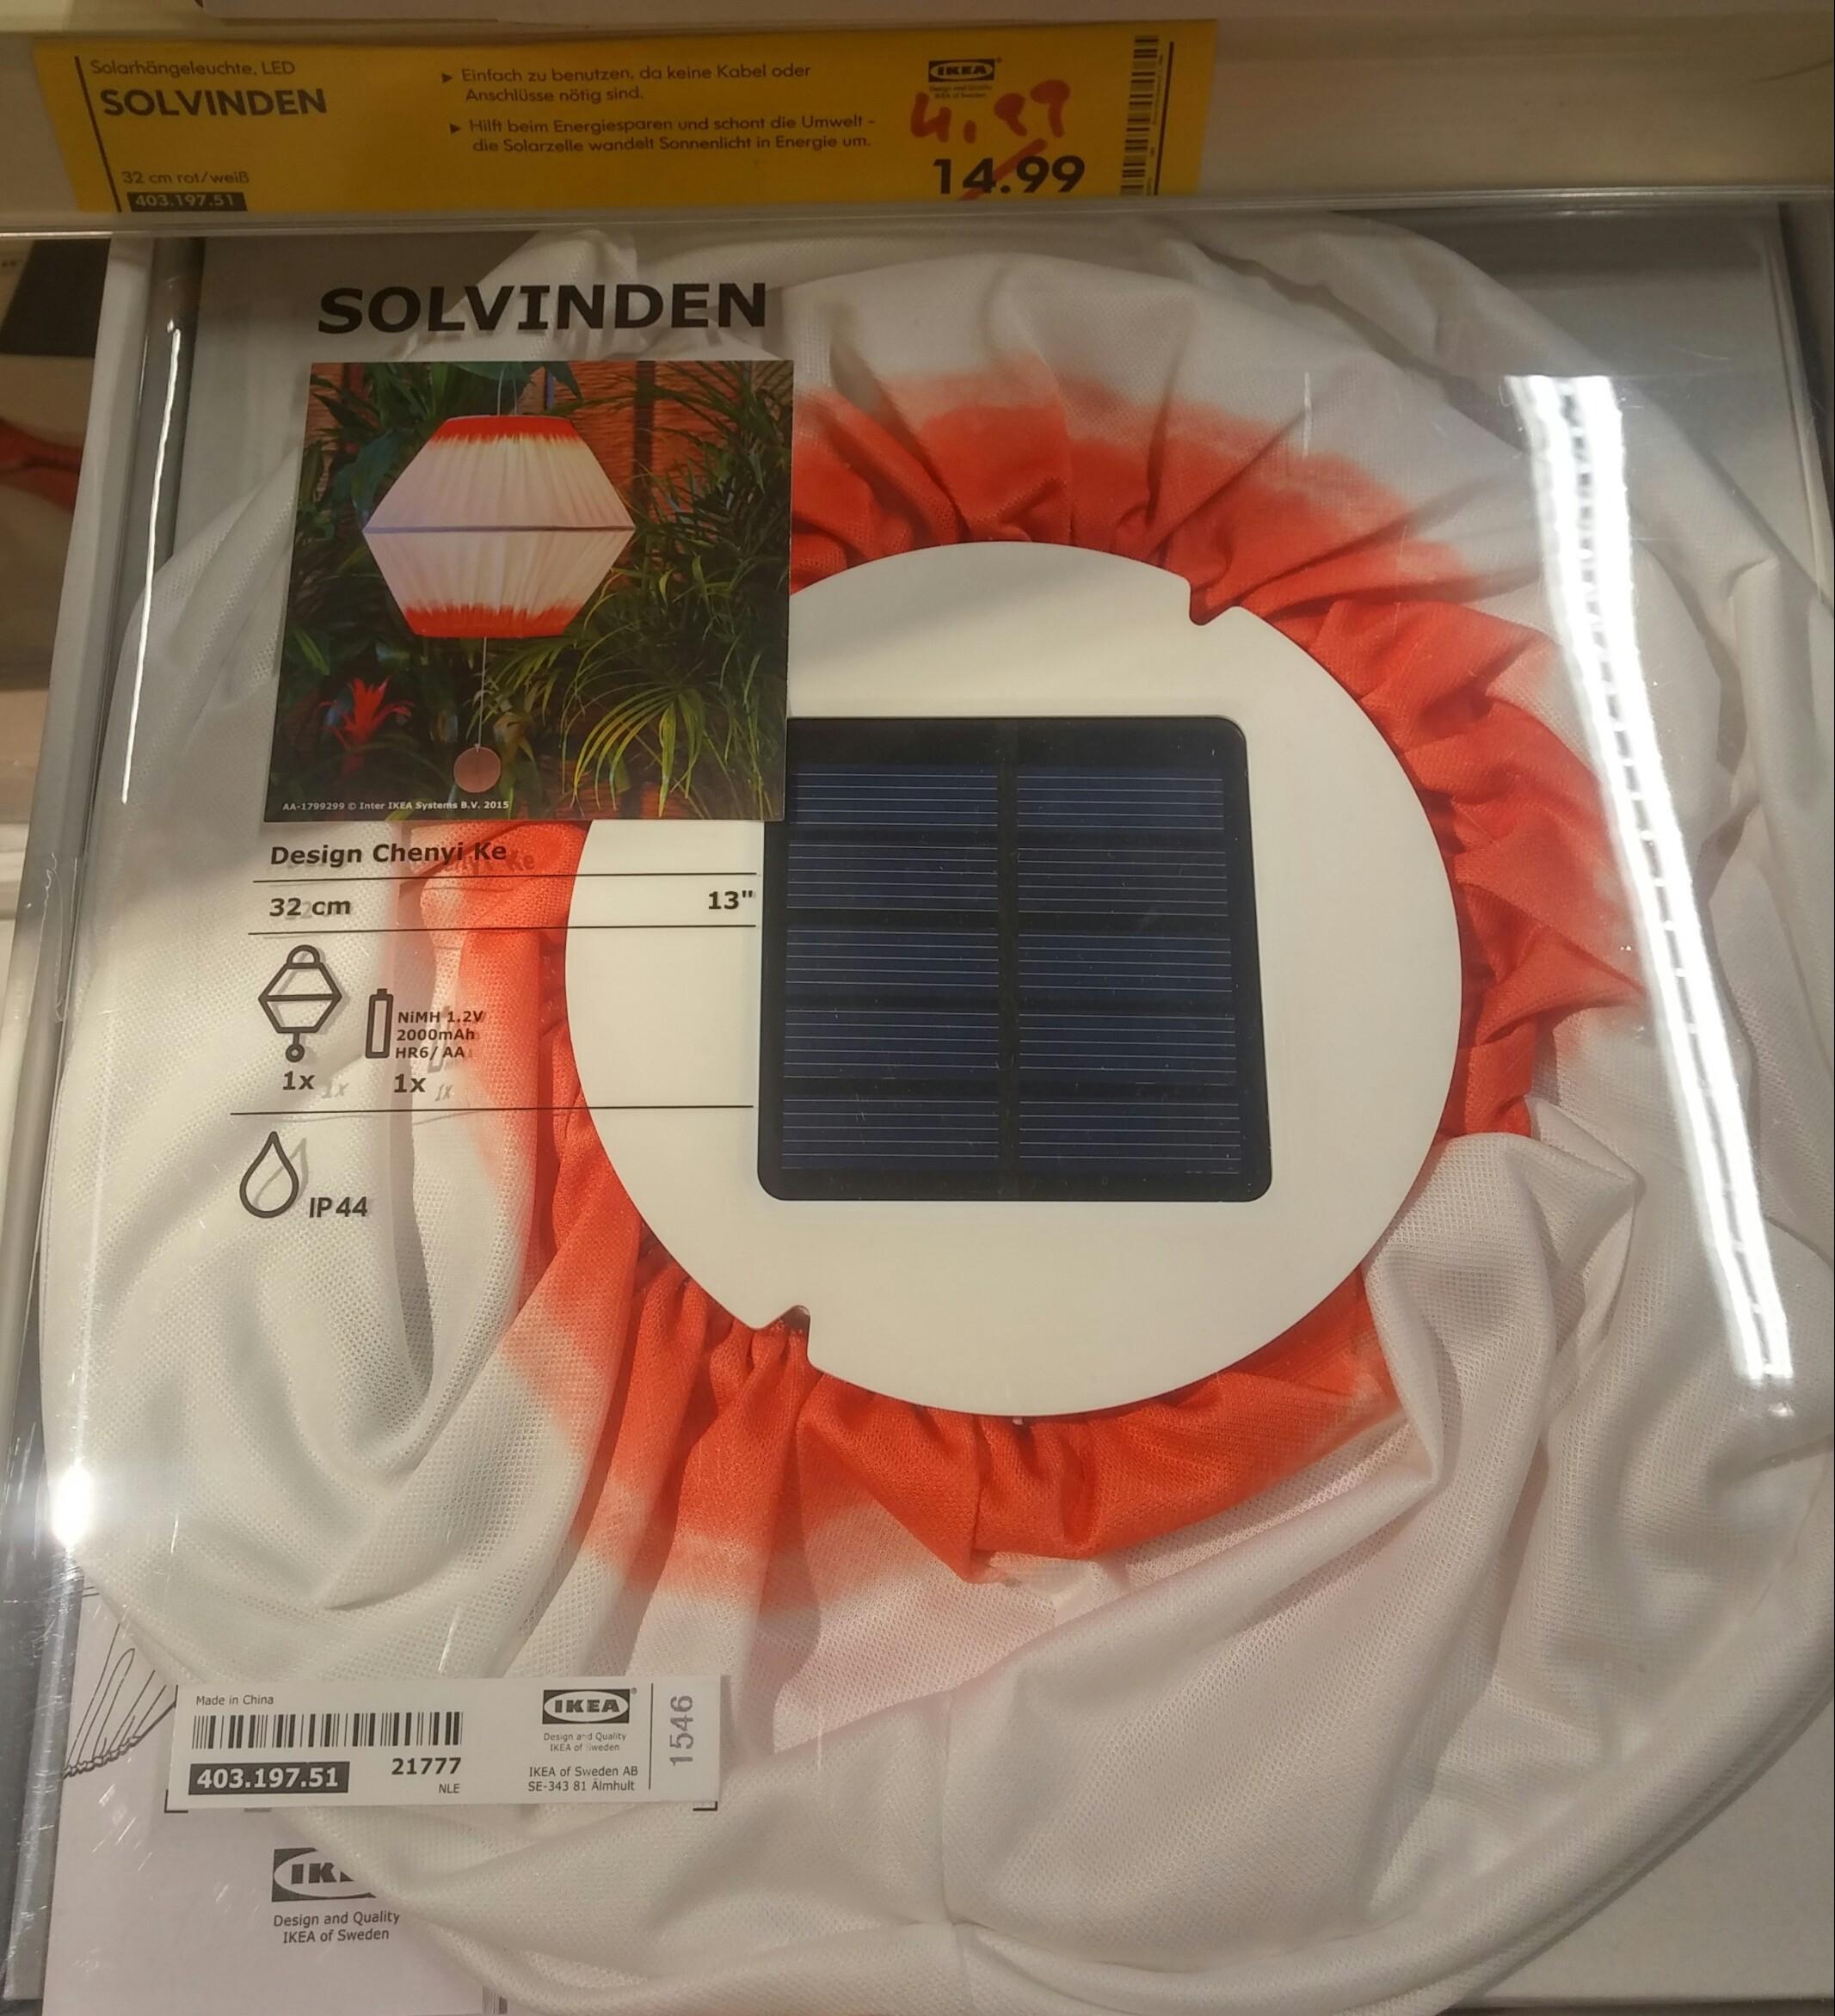 IKEA Solvinden LED Solarleuchte [Lokal Köln Godorf]